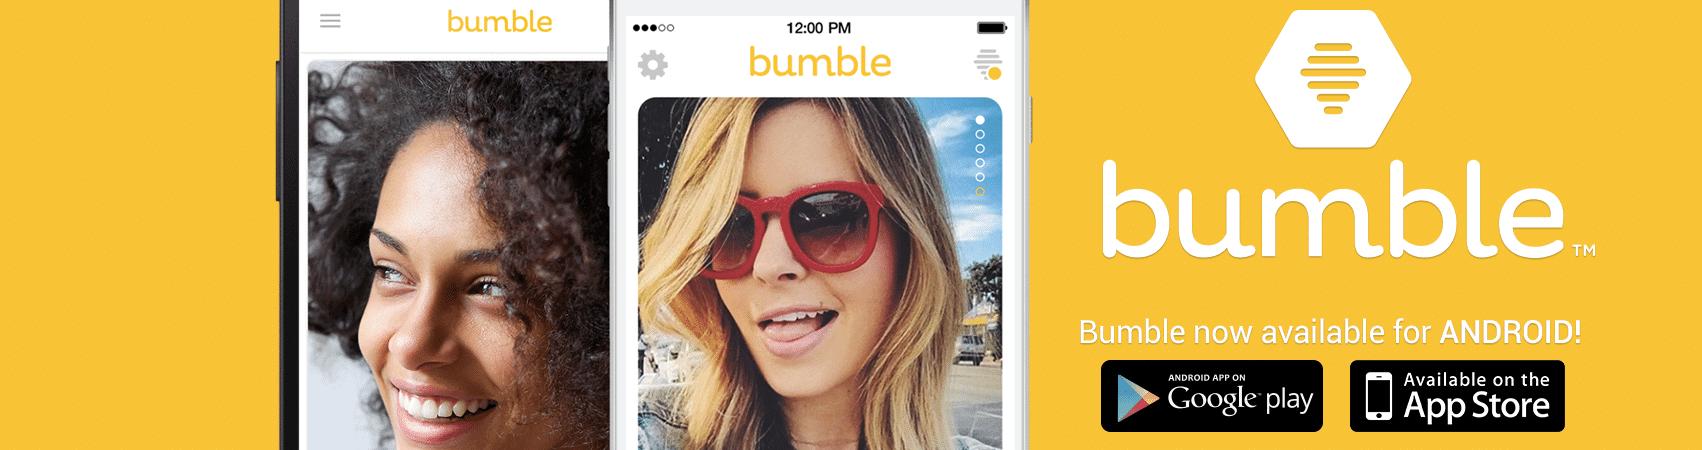 bumble-1702x450.png